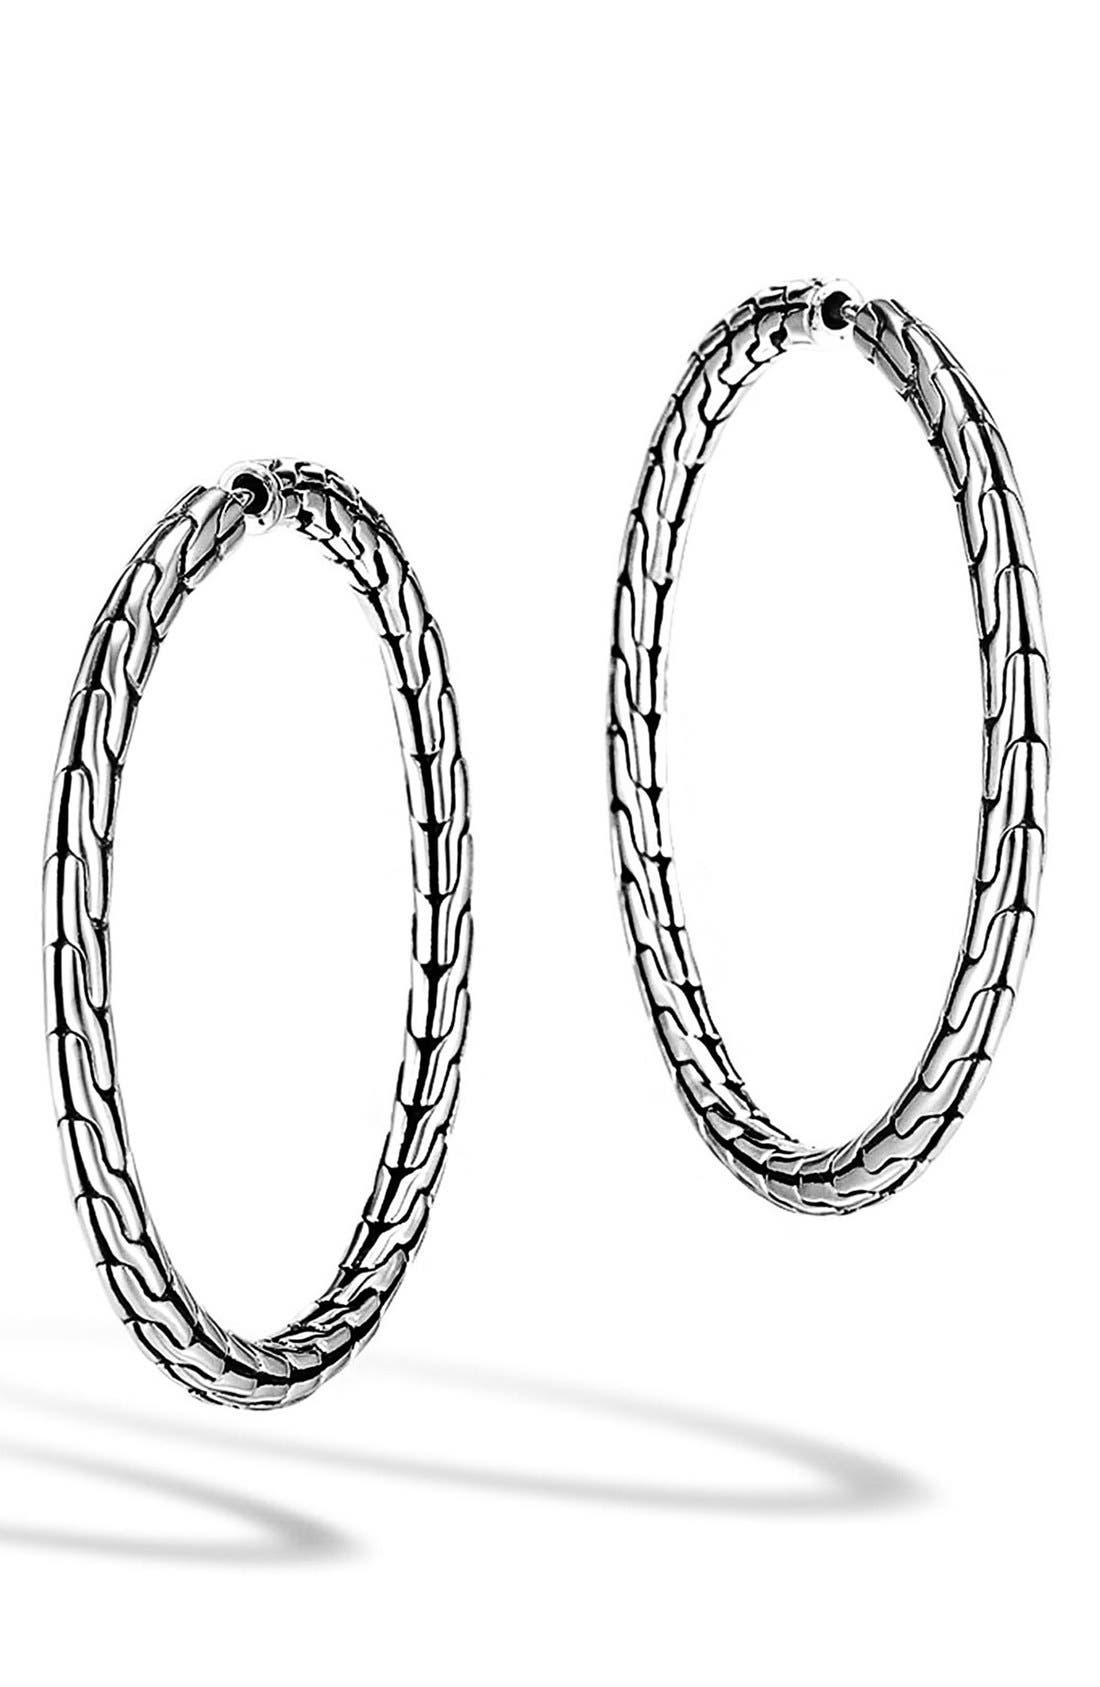 Alternate Image 1 Selected - John Hardy 'Classic Chain' Medium Hoop Earrings